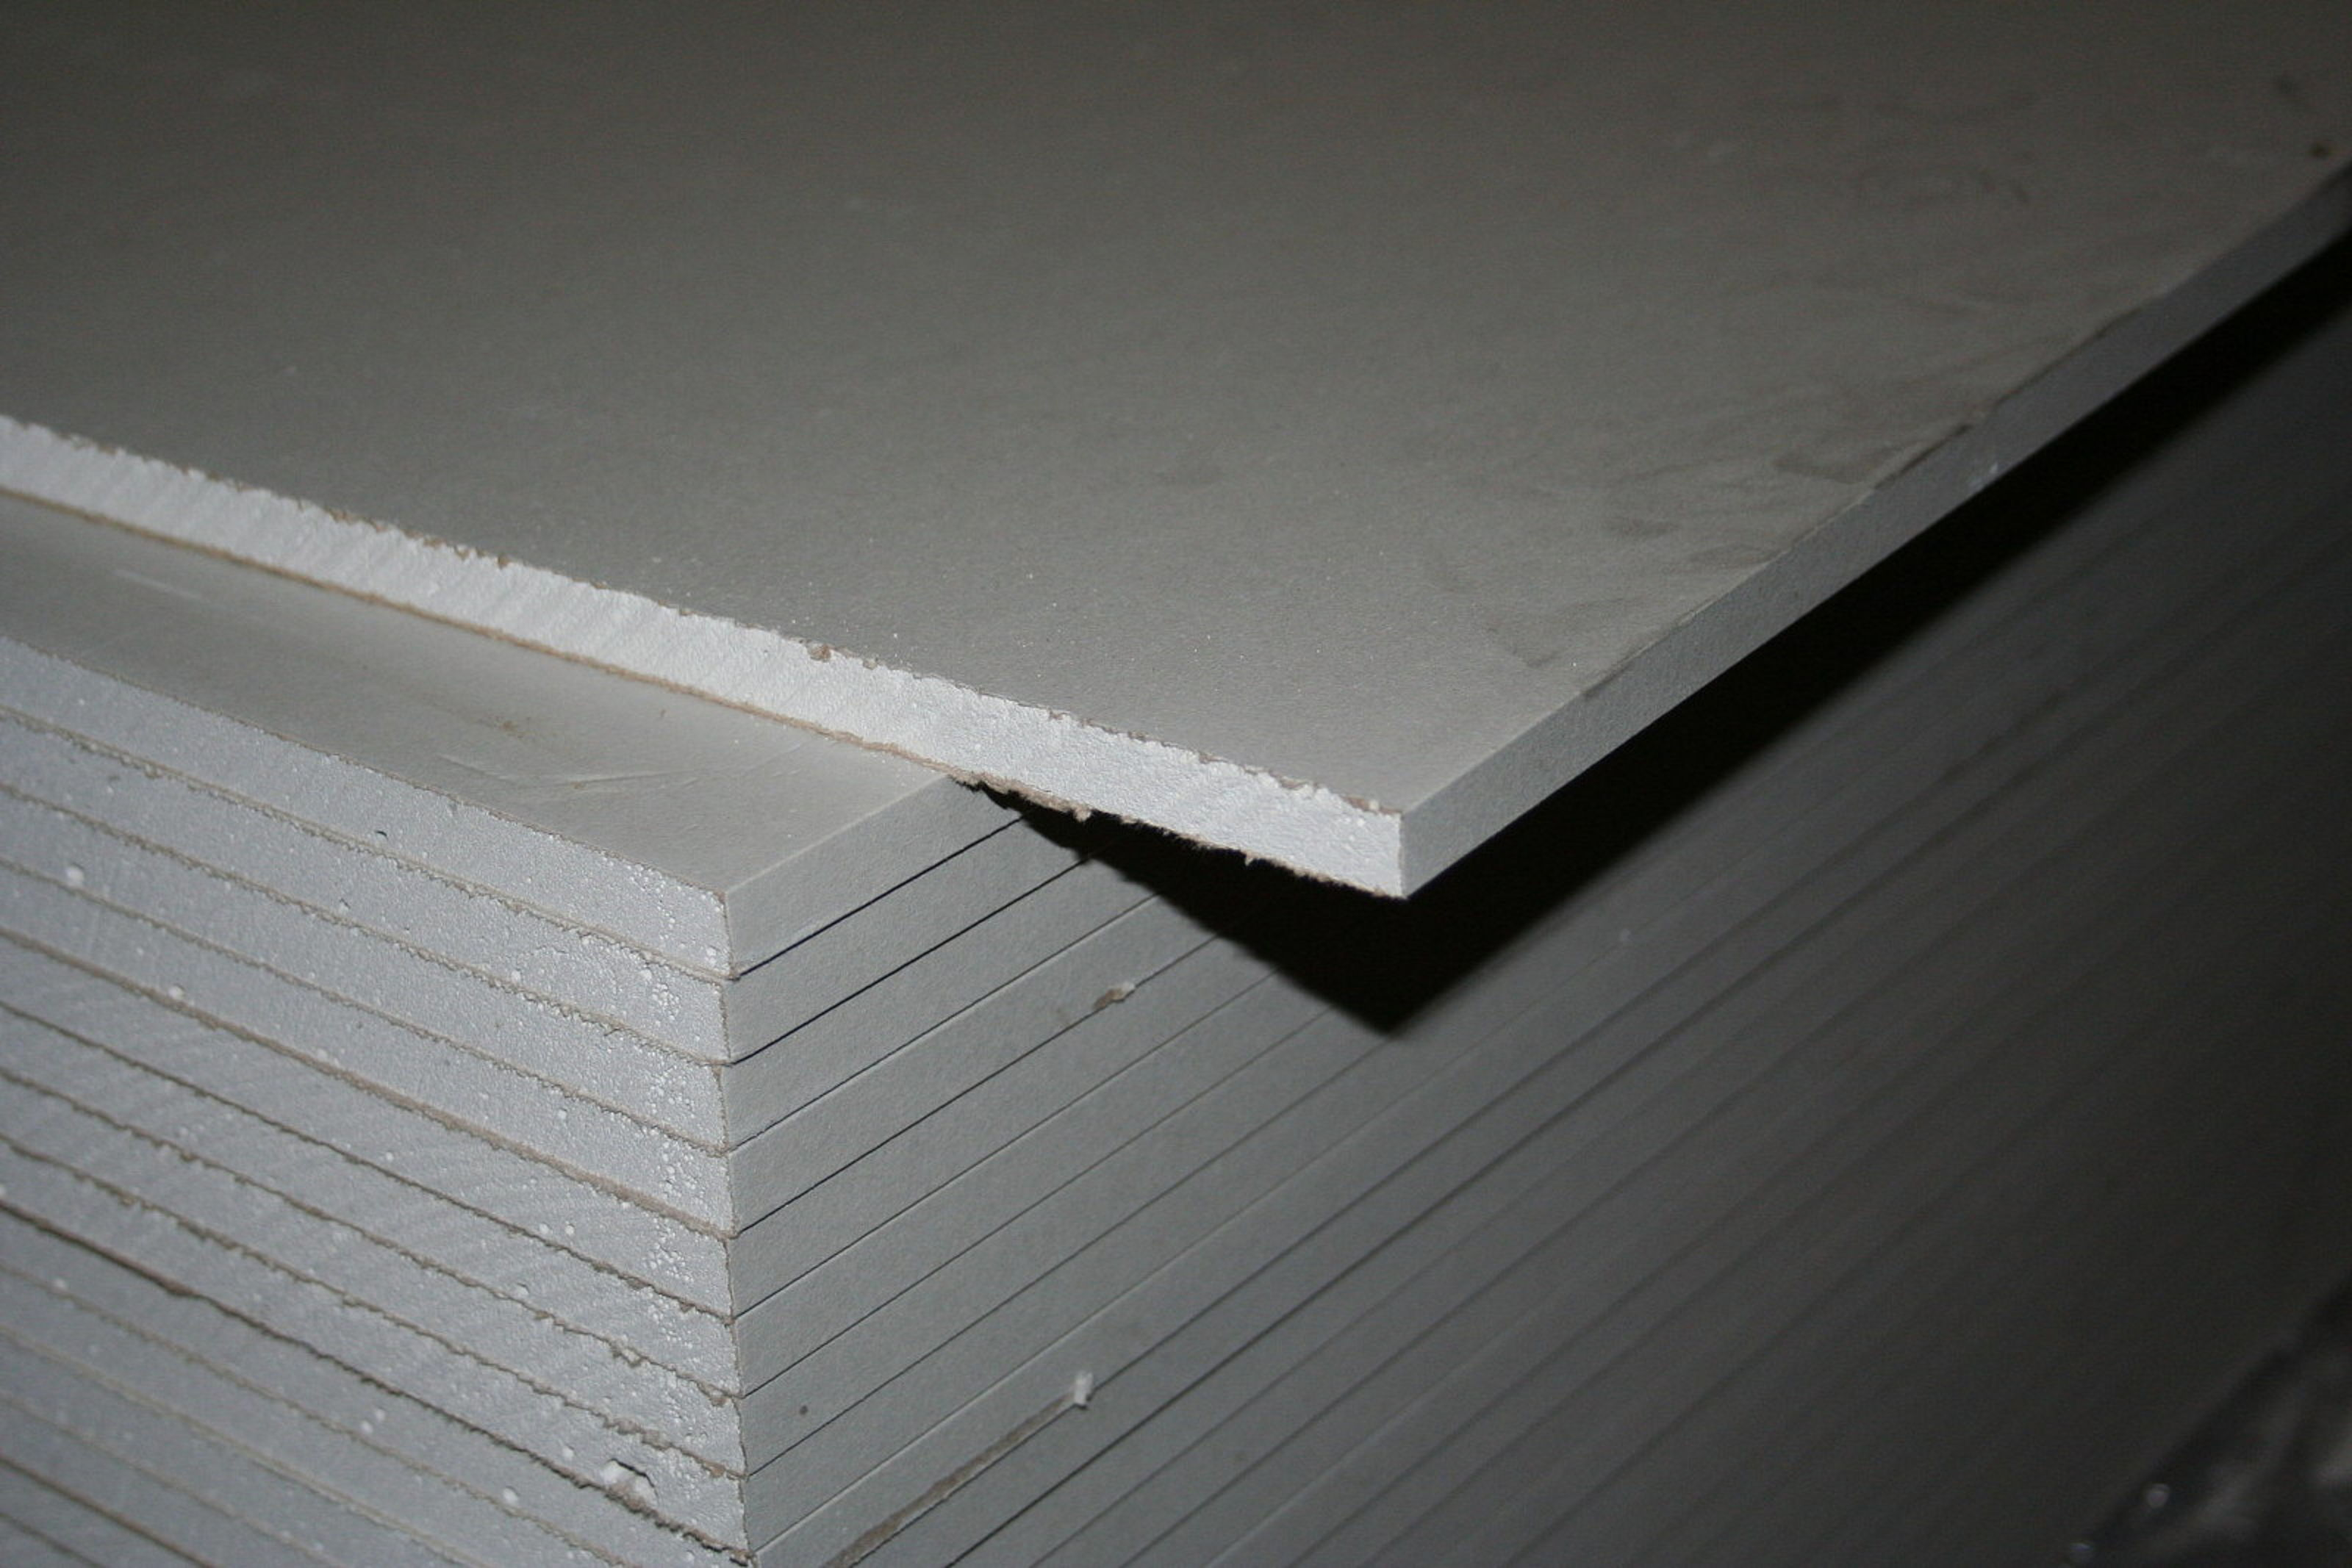 12mm plasterboard